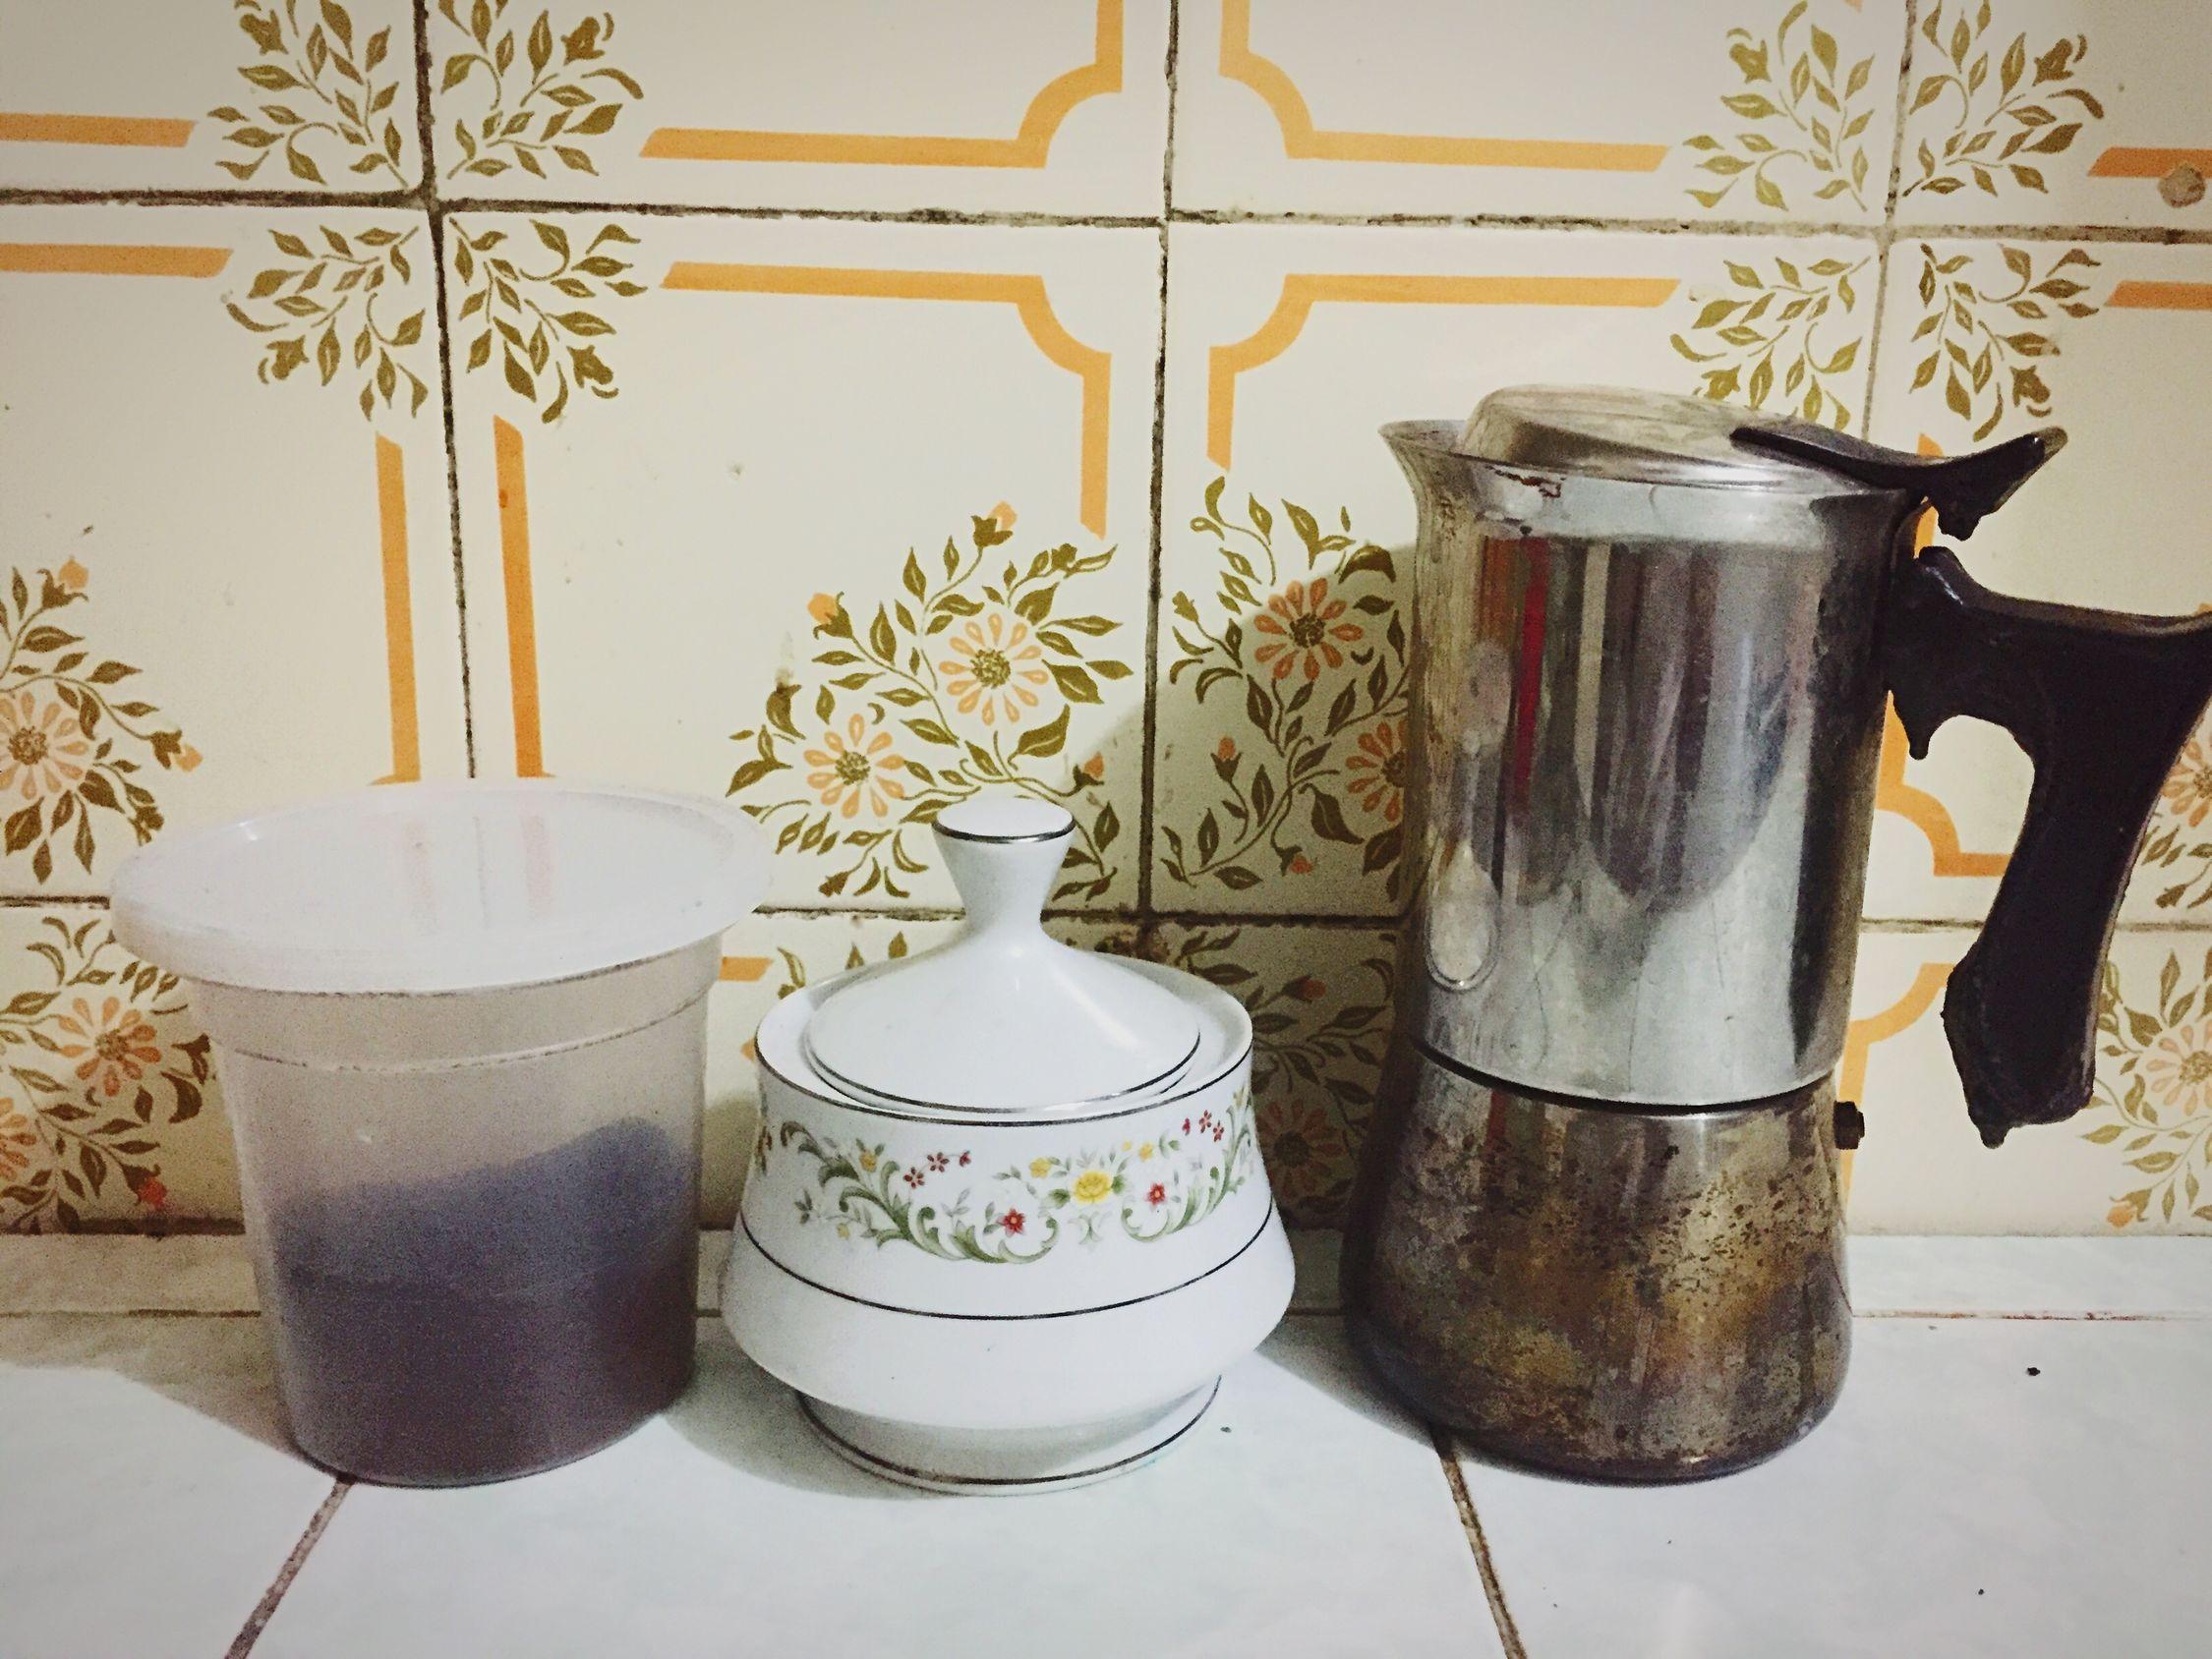 EyeEm Selects ¿Quieres un poco de café? // Do you want some coffee? Indoors  Home Interior Coffee Close-up No People No People, EyeEm Selects